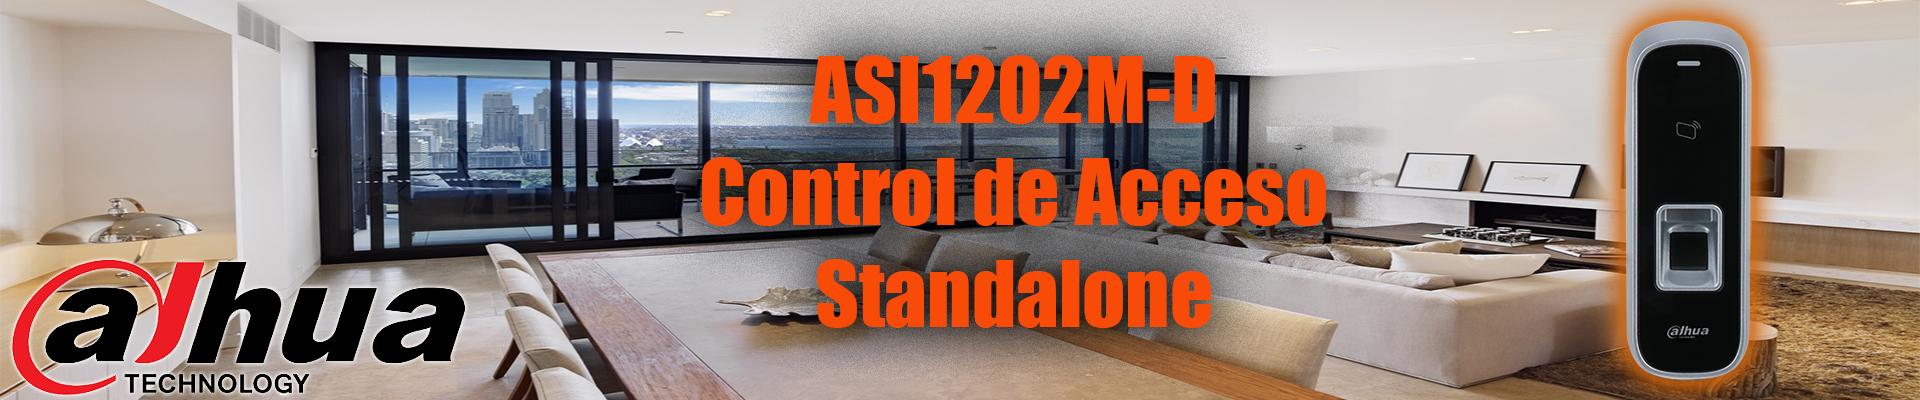 Dahua-ASI1202MD-CONTROL-DE-ACCESO-STAND-